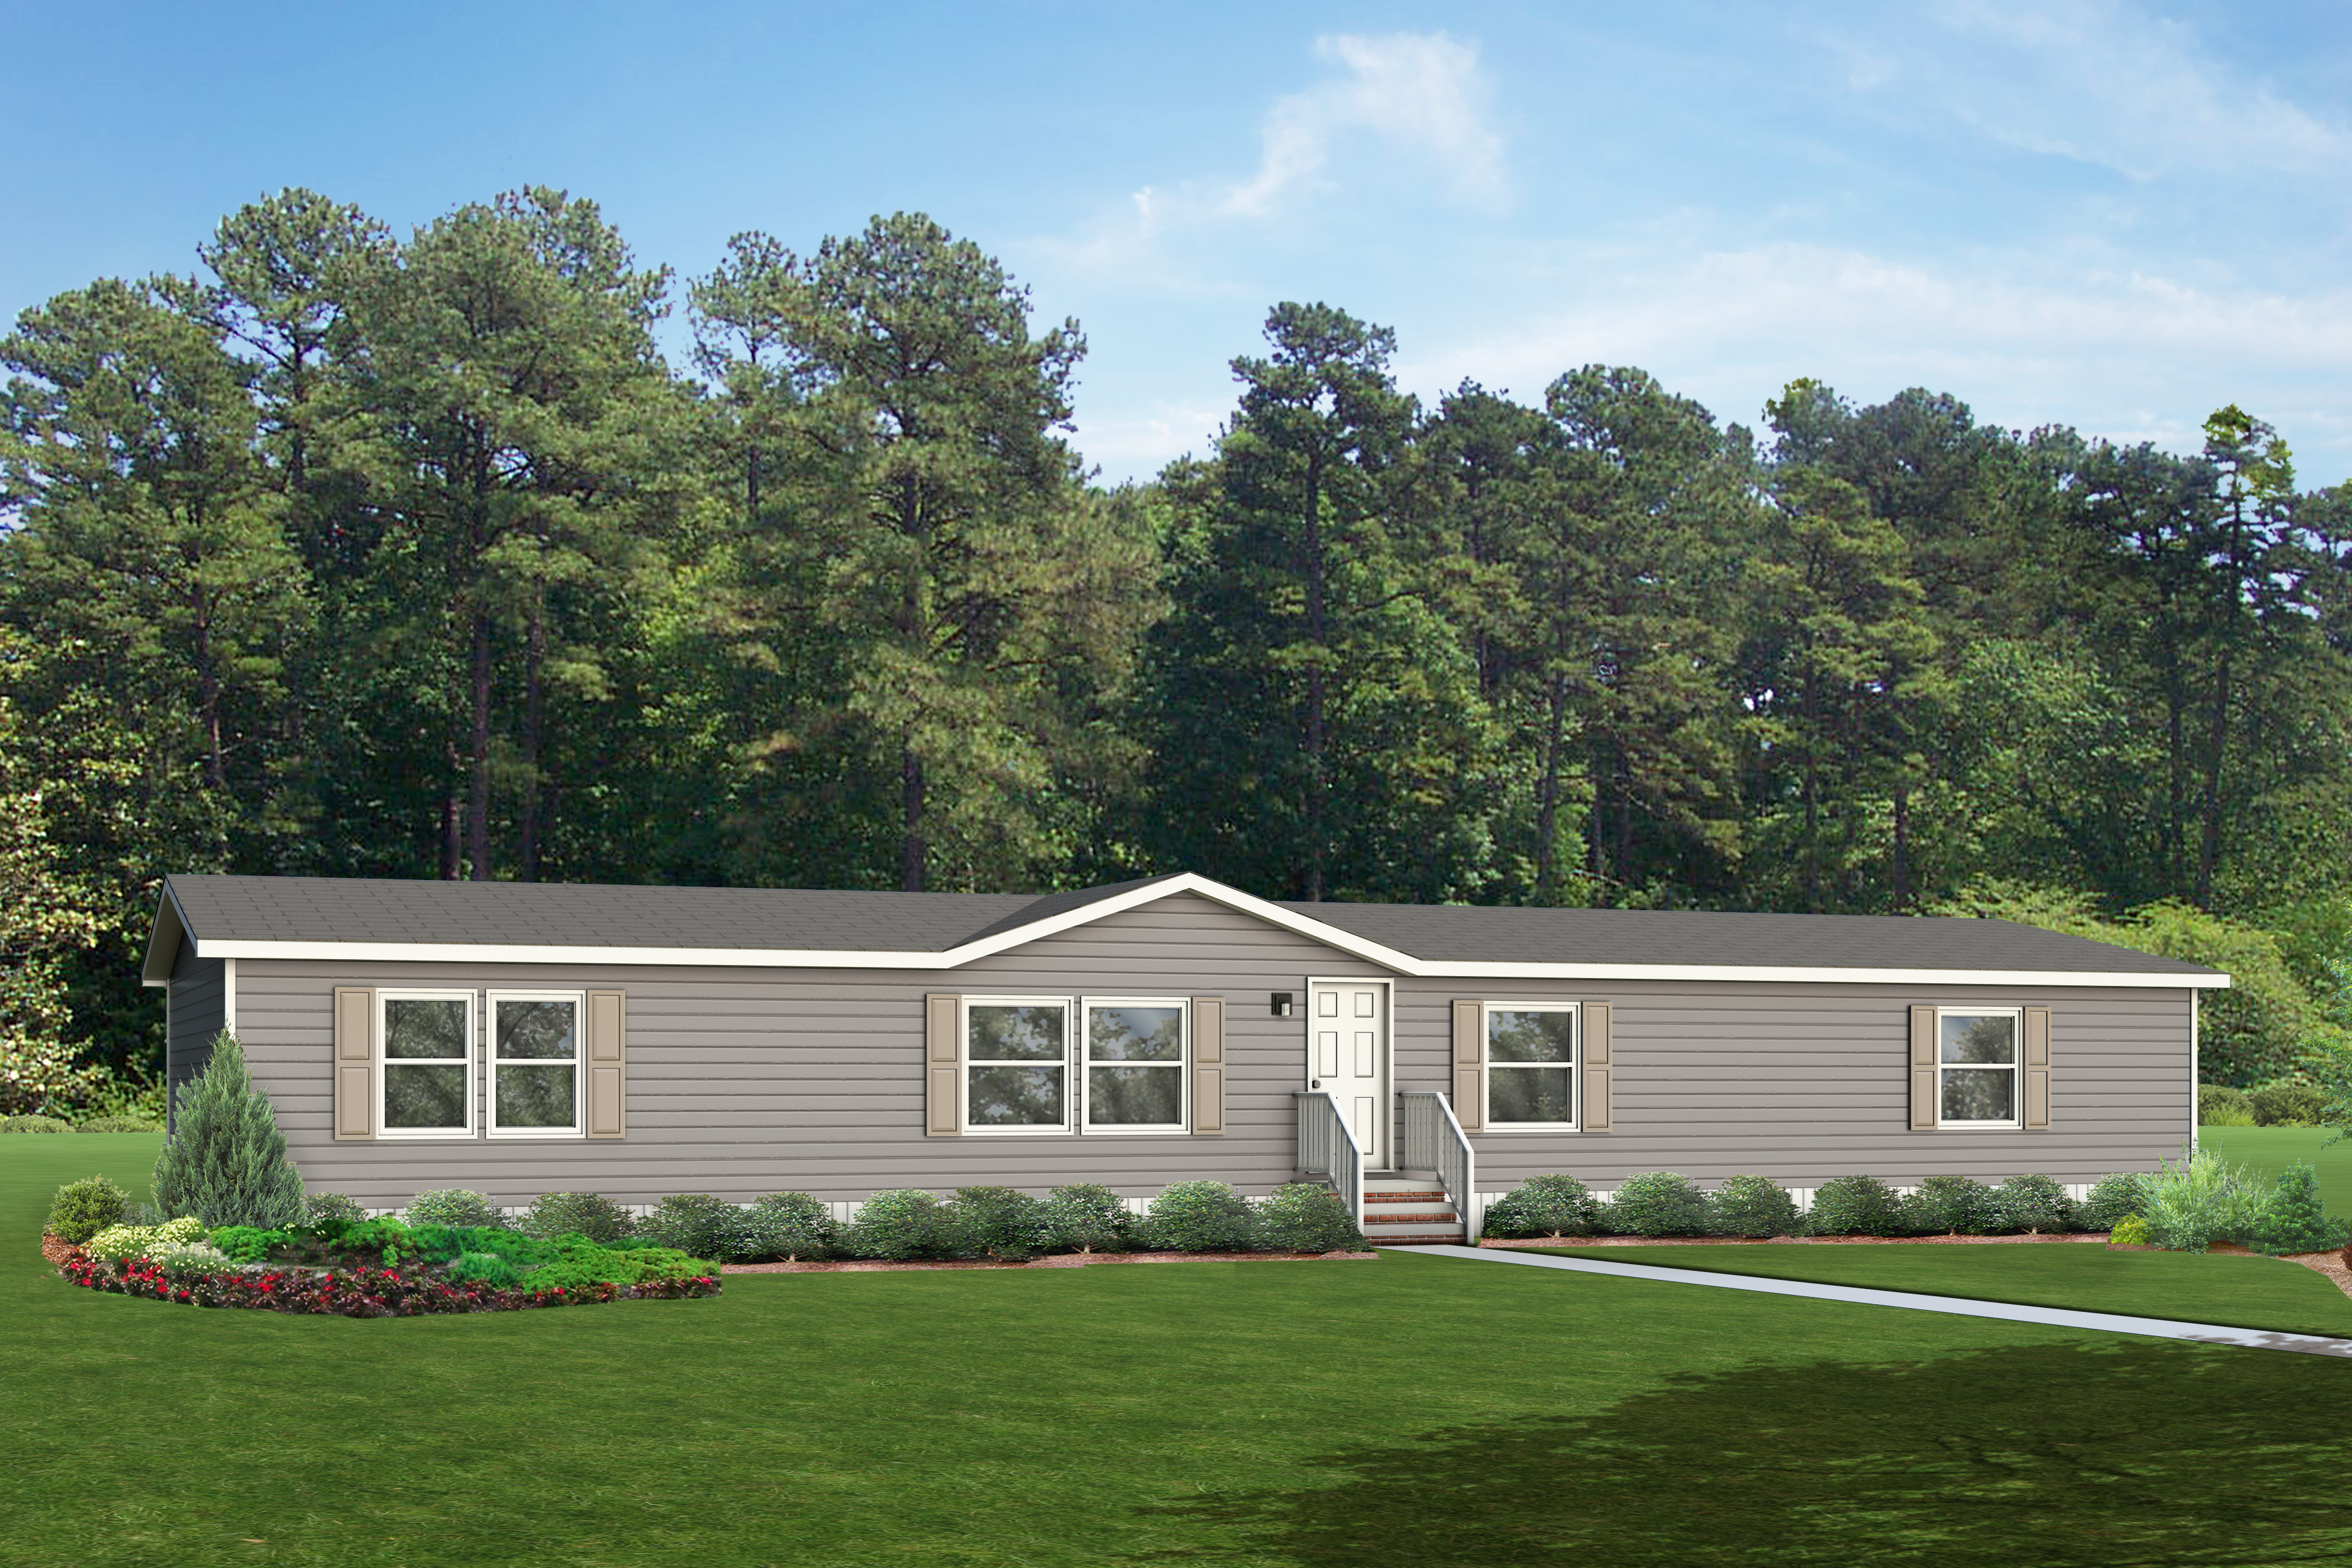 Model 9906 mobile home